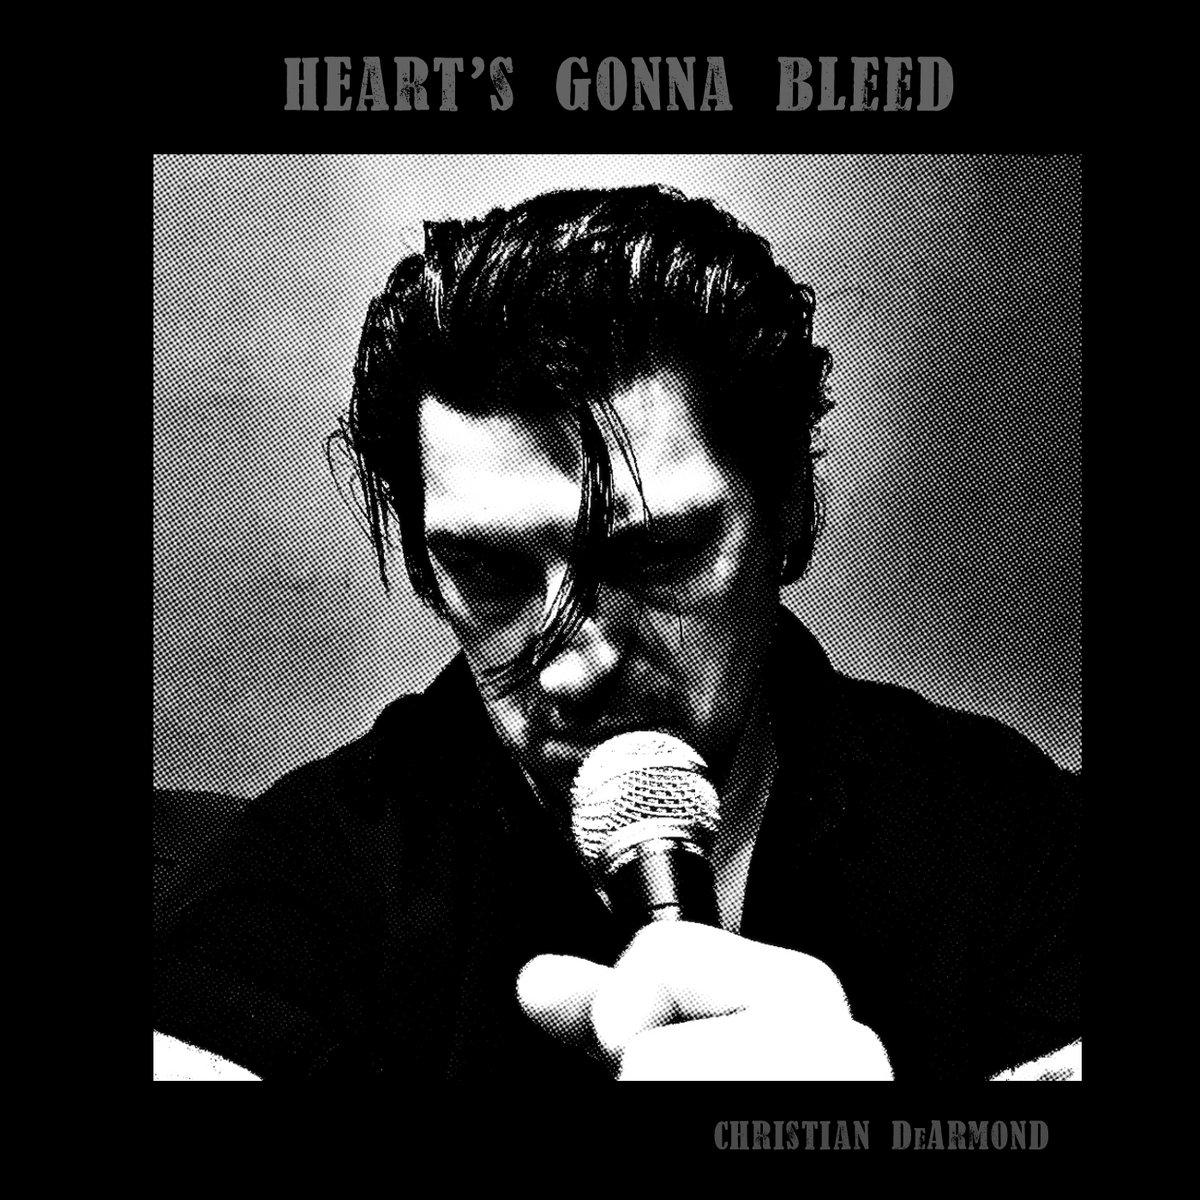 Heart's Gonna Bleed by Christian DeArmond